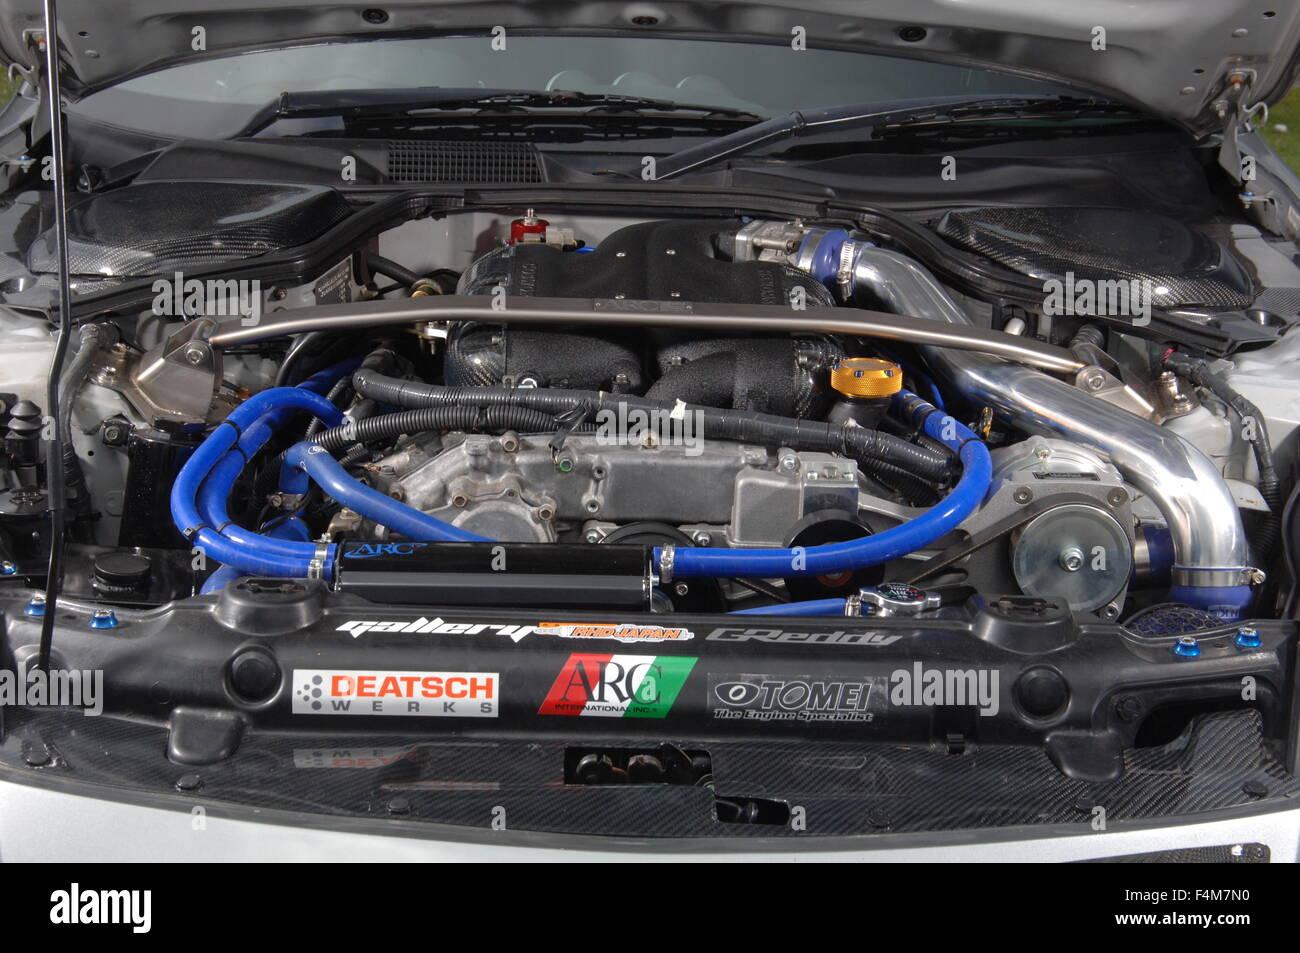 sports car engine nissan 350z tuned car stock photo royalty free image 88955580 alamy. Black Bedroom Furniture Sets. Home Design Ideas